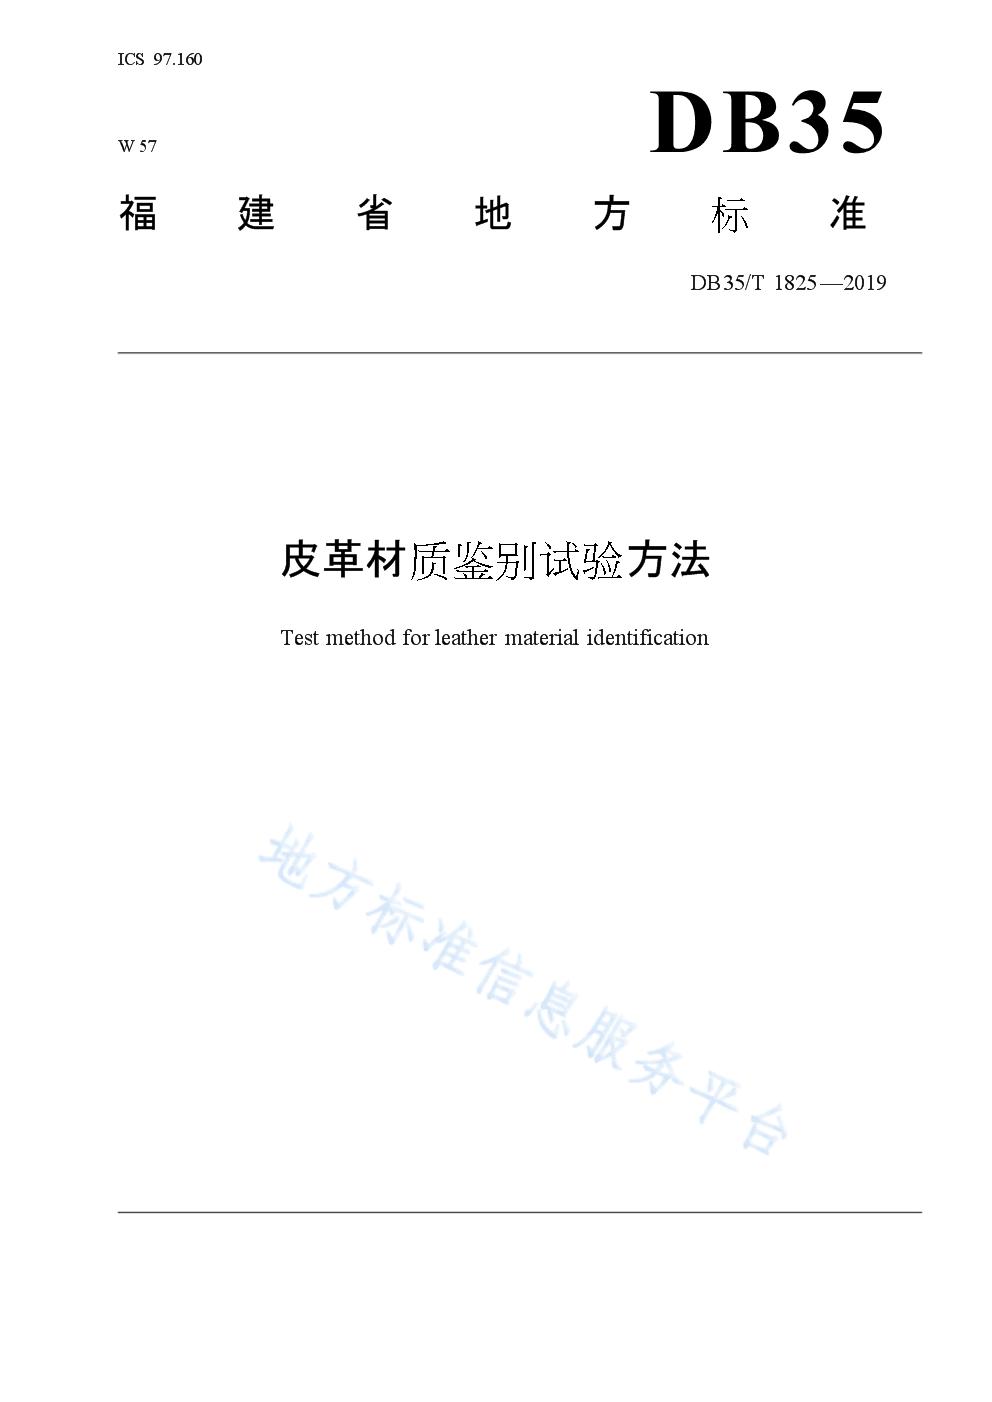 DB35_T 1825-2019皮革材质鉴别试验方法.docx